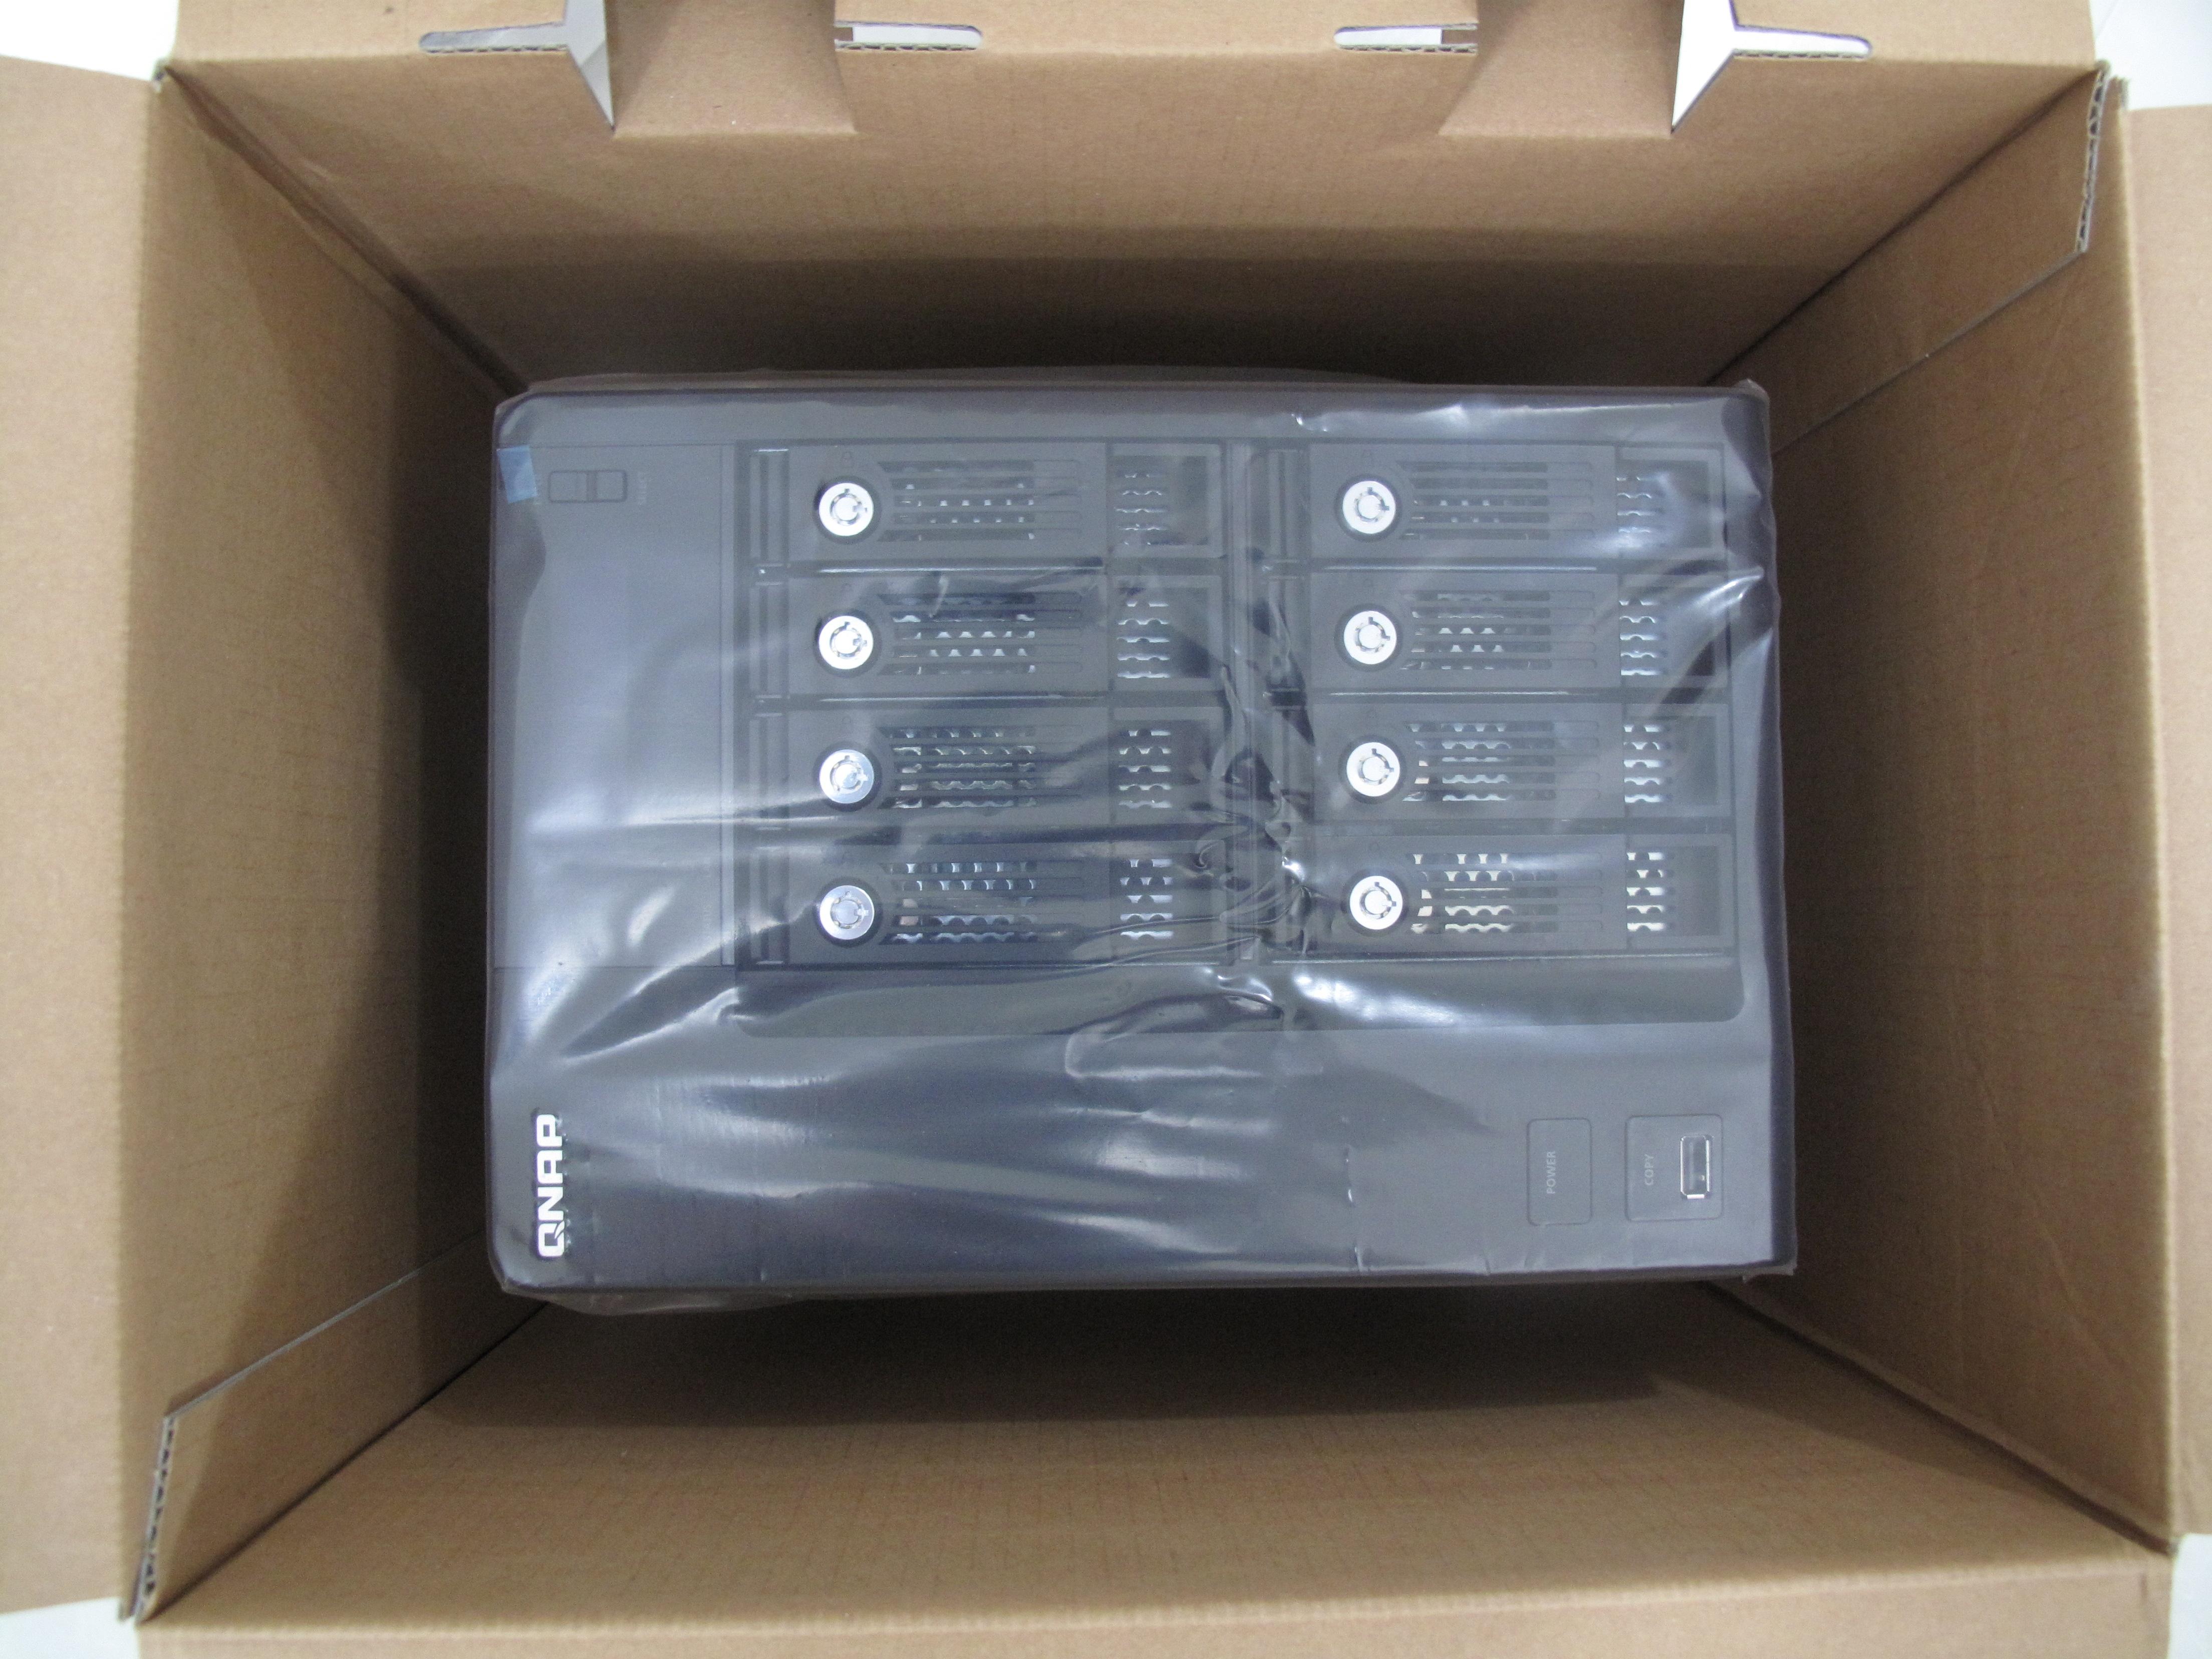 Plastic bag history - File Qnap Ts 809 Pro With Plastic Bag 20090517 Jpg